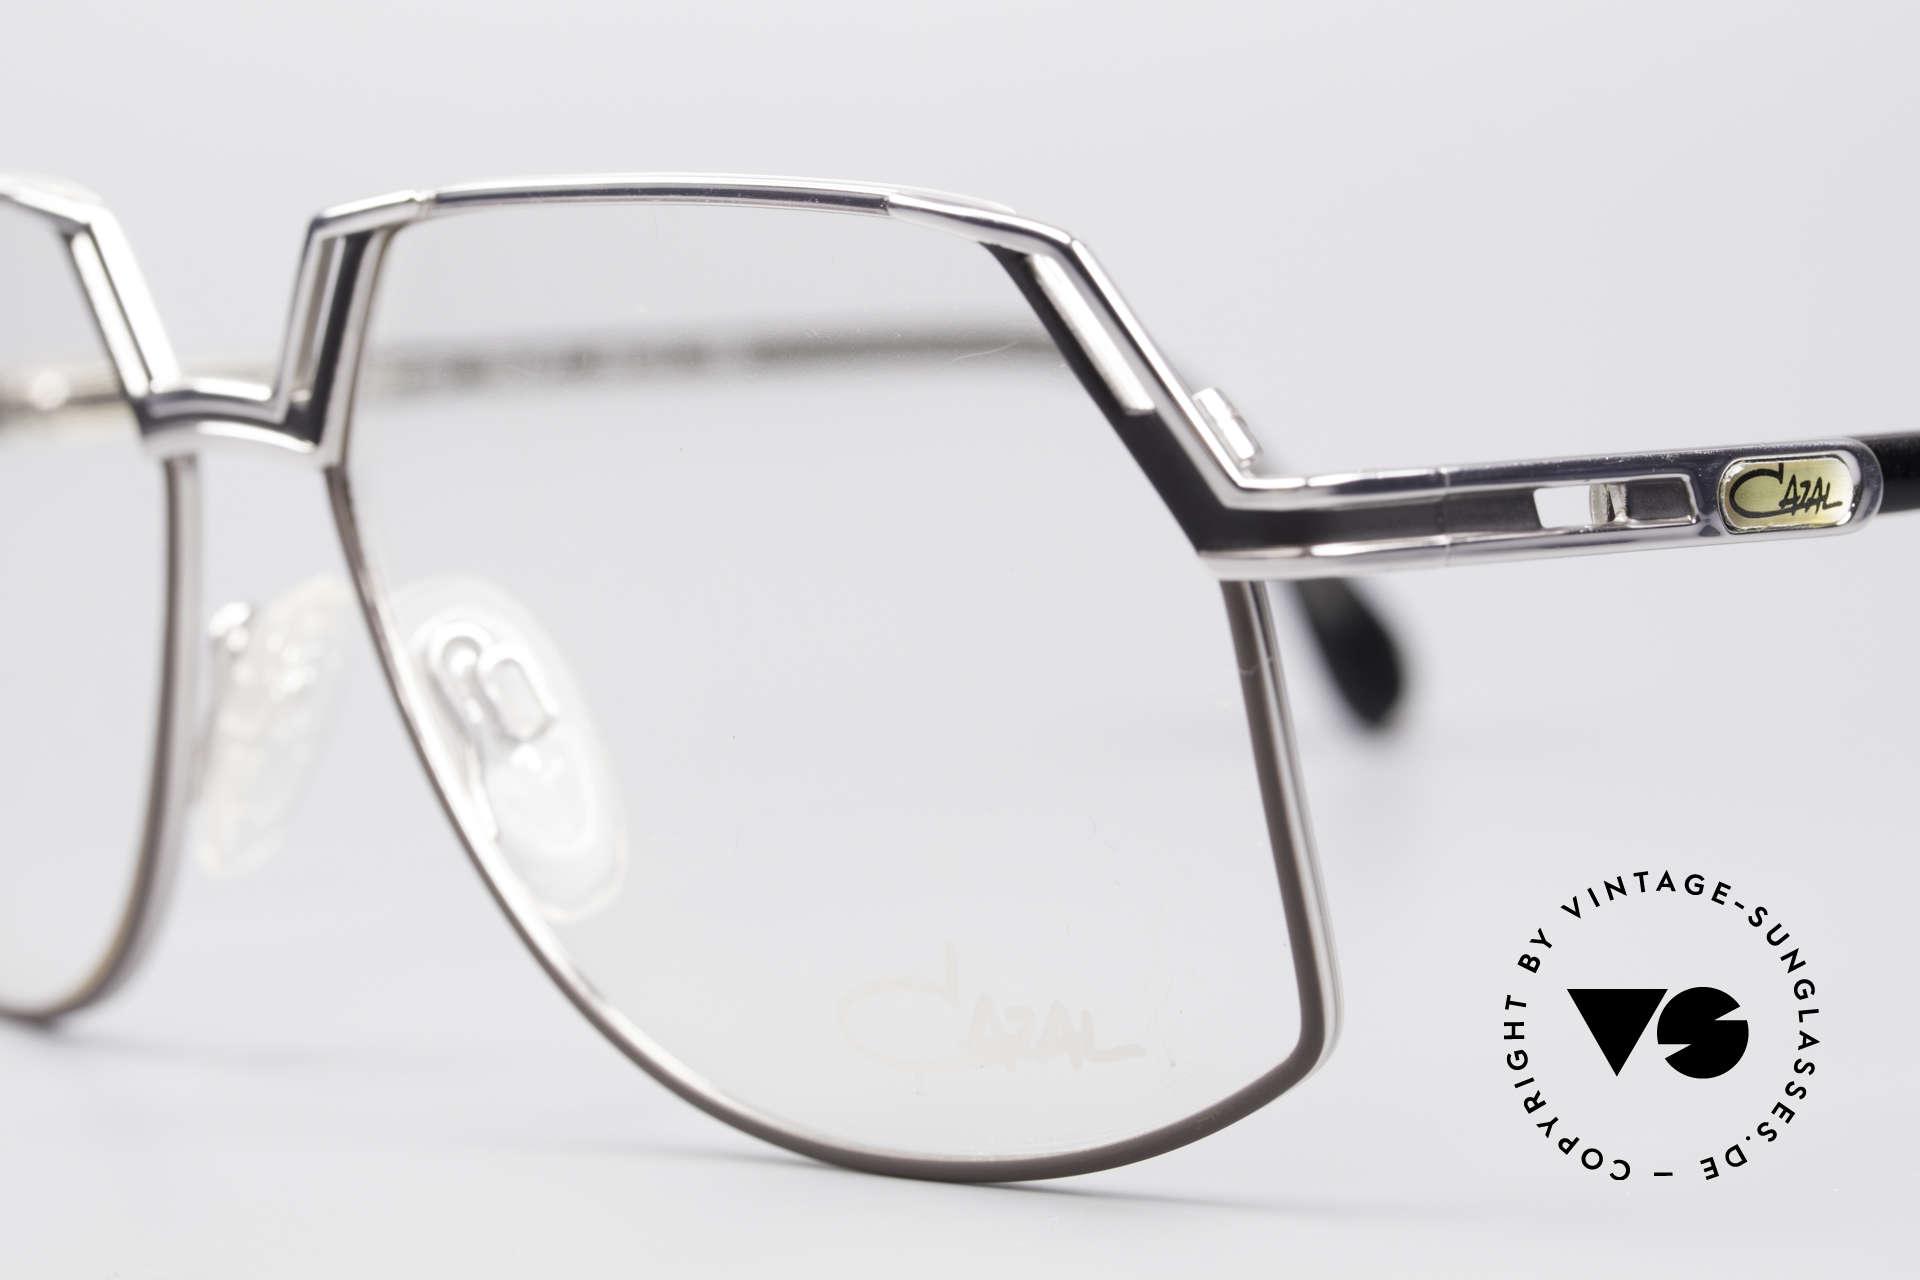 Cazal 738 True Vintage Eyeglasses, NO RETRO EYEWEAR, but a rare 30 years old ORIGINAL, Made for Men